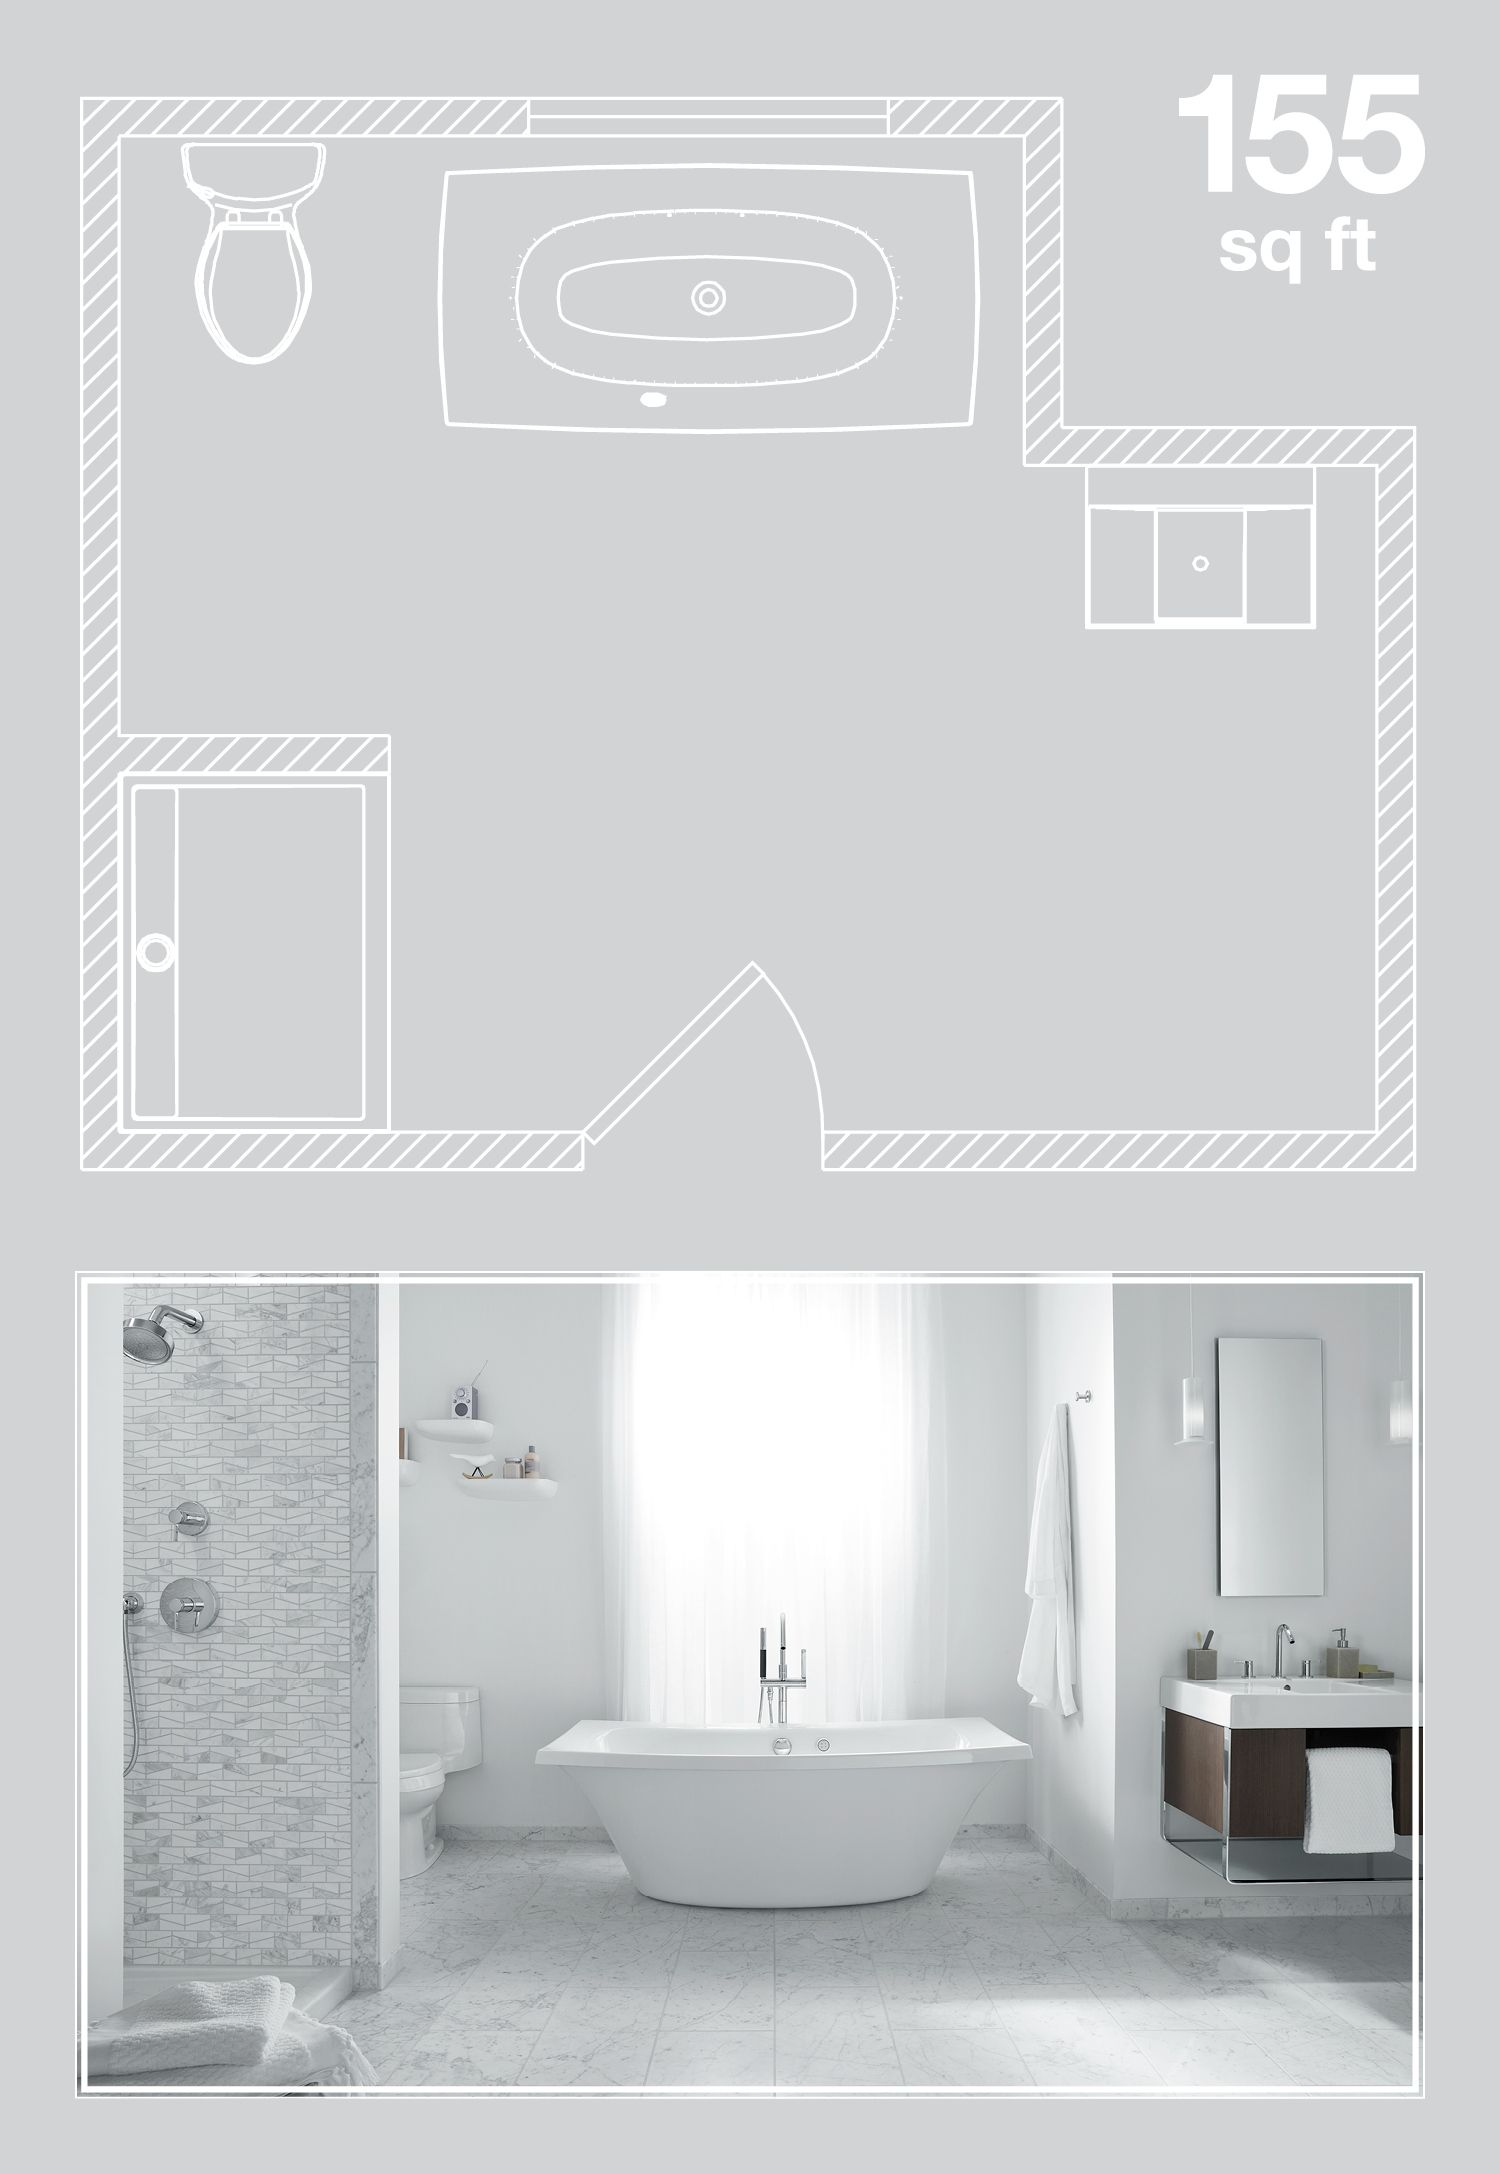 Small Bathroom 1 Bathroom Remodeling Solutions Bathrooms Remodel Kitchen And Bath Showroom Free Standing Bath Tub